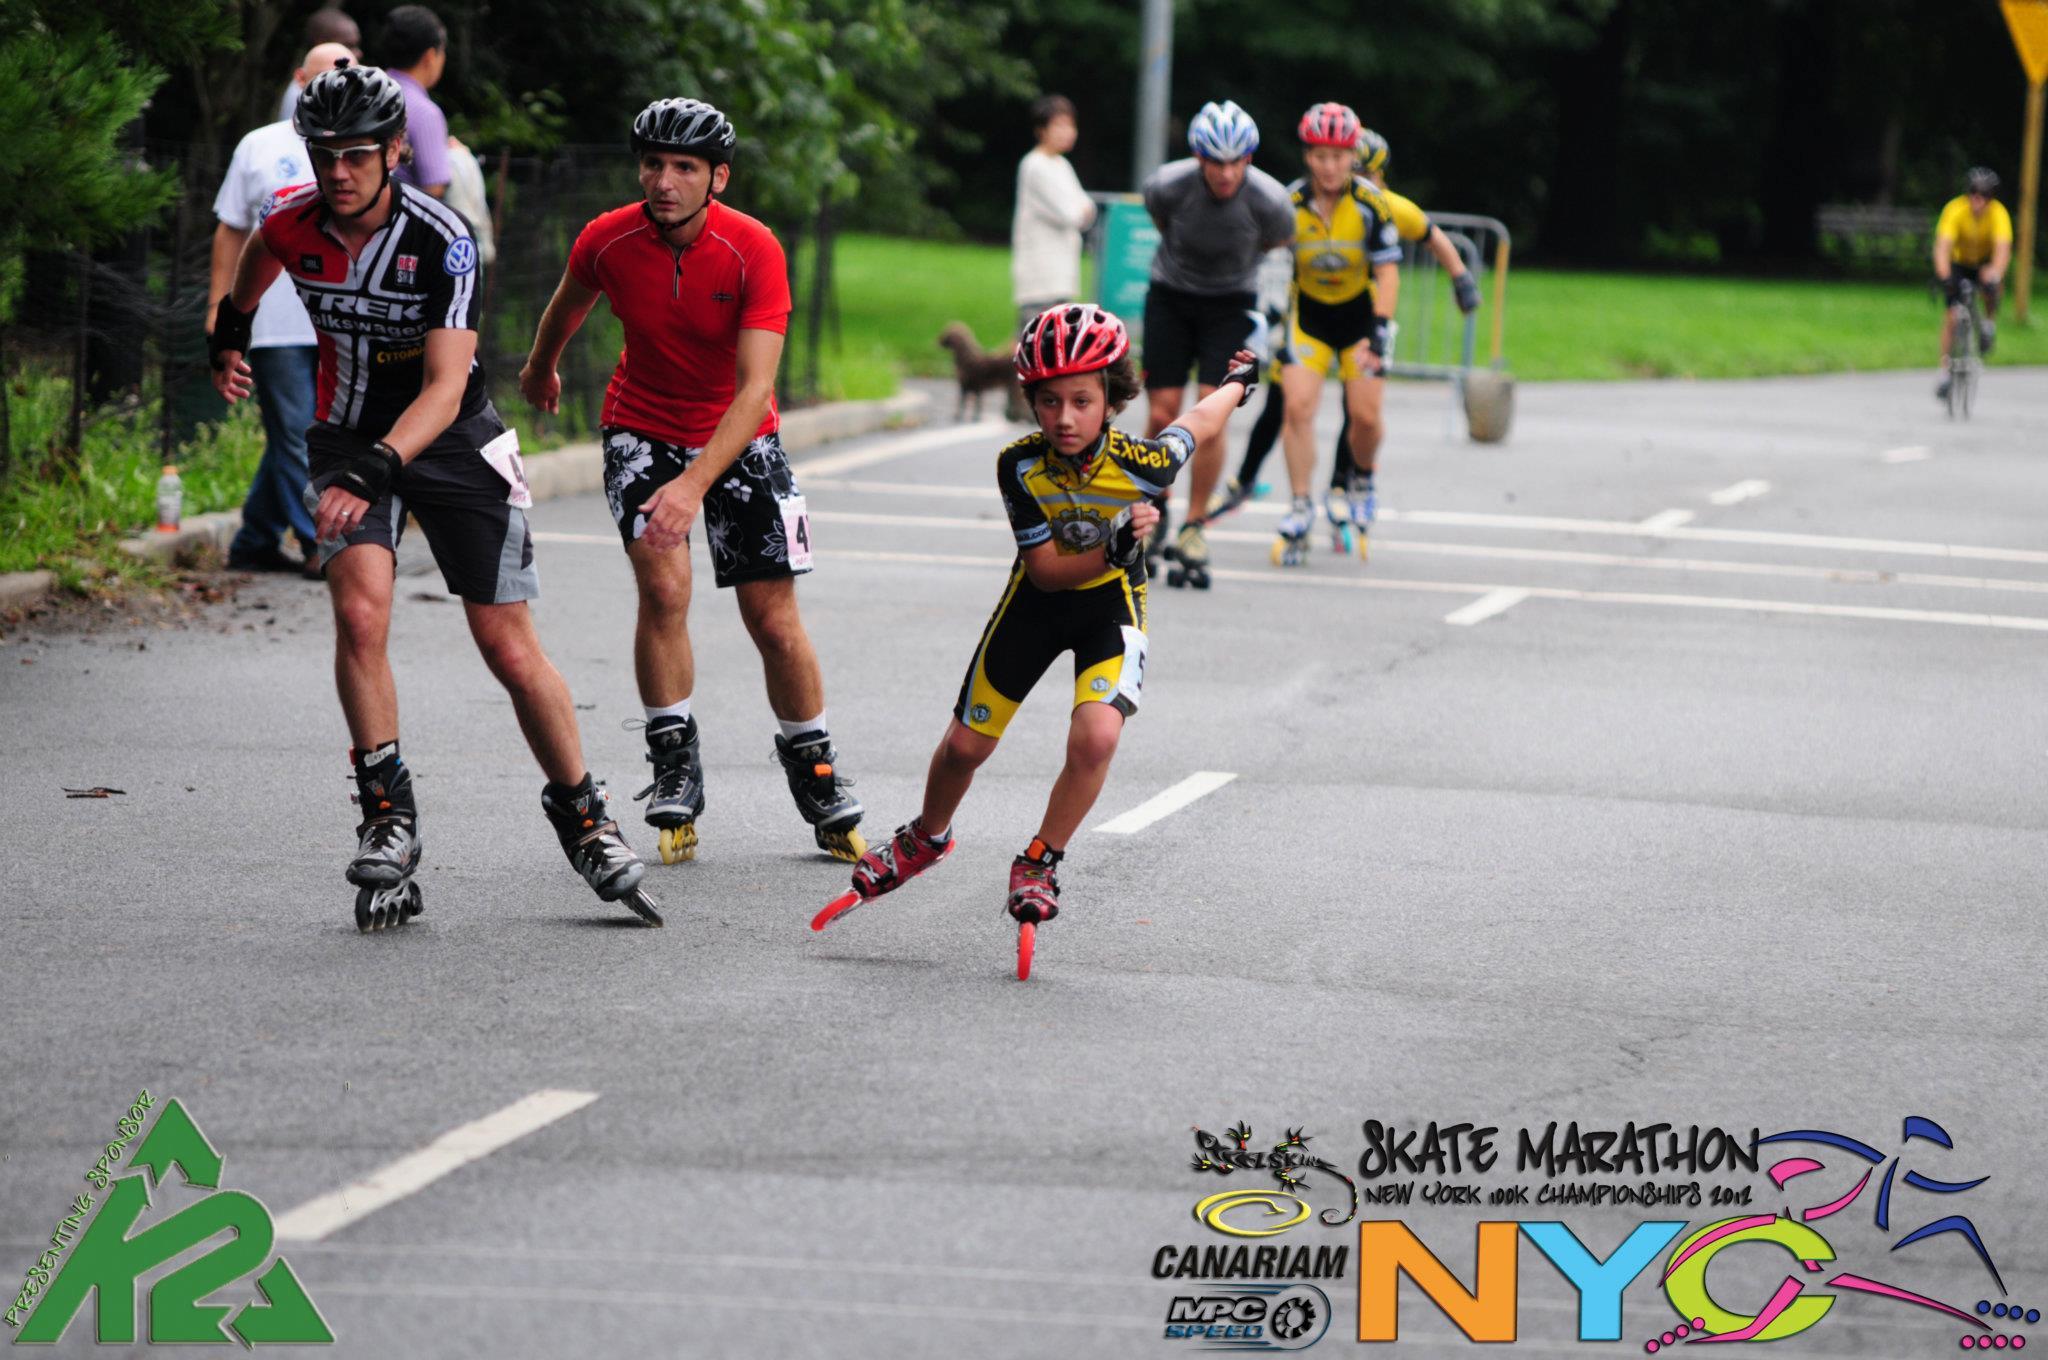 Roller skates york - 44490fc3 6f12 43bd B6b6 3d369bb53e20